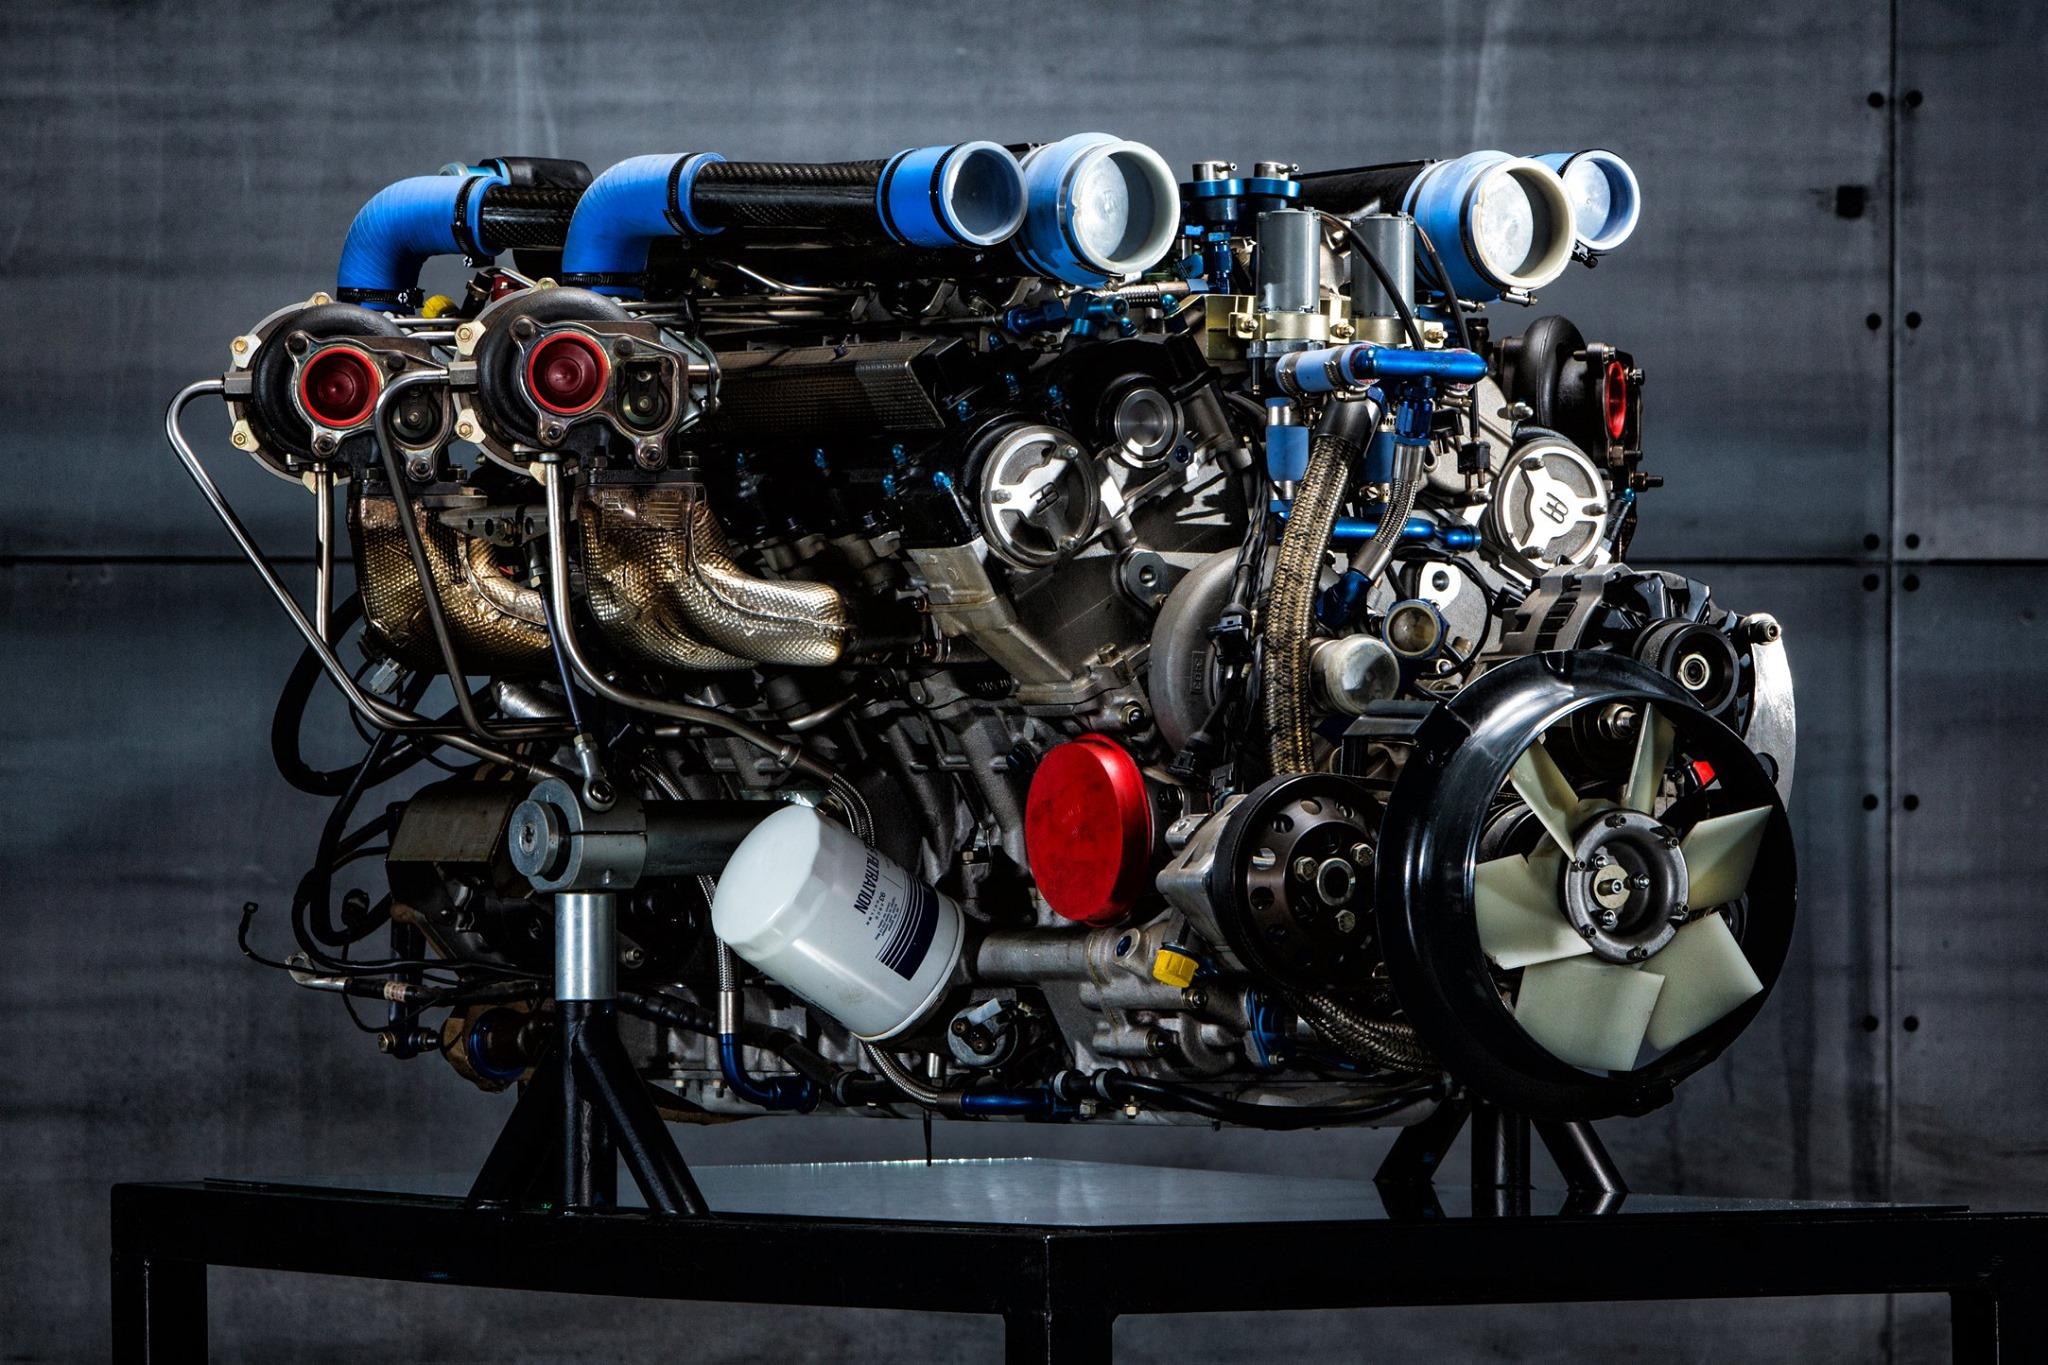 Bugatti Chiron Engine-W16-Turbo 8 liters